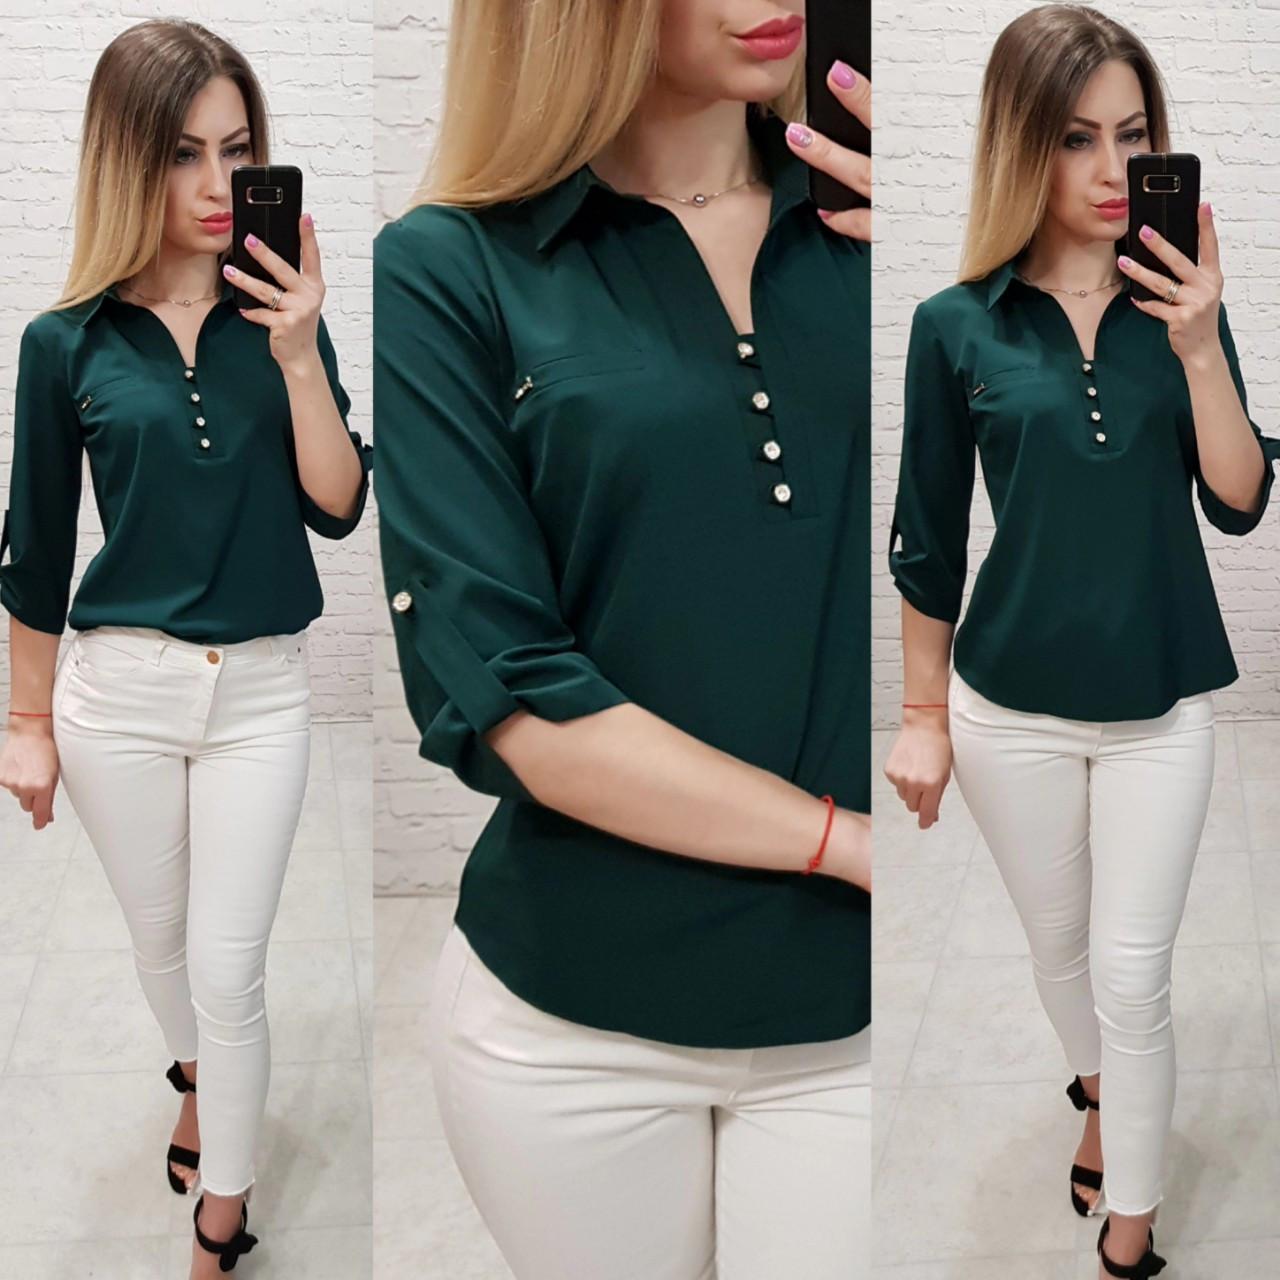 Рубашка / блуза / блузка арт. 828 темно зелёного /  зелёный